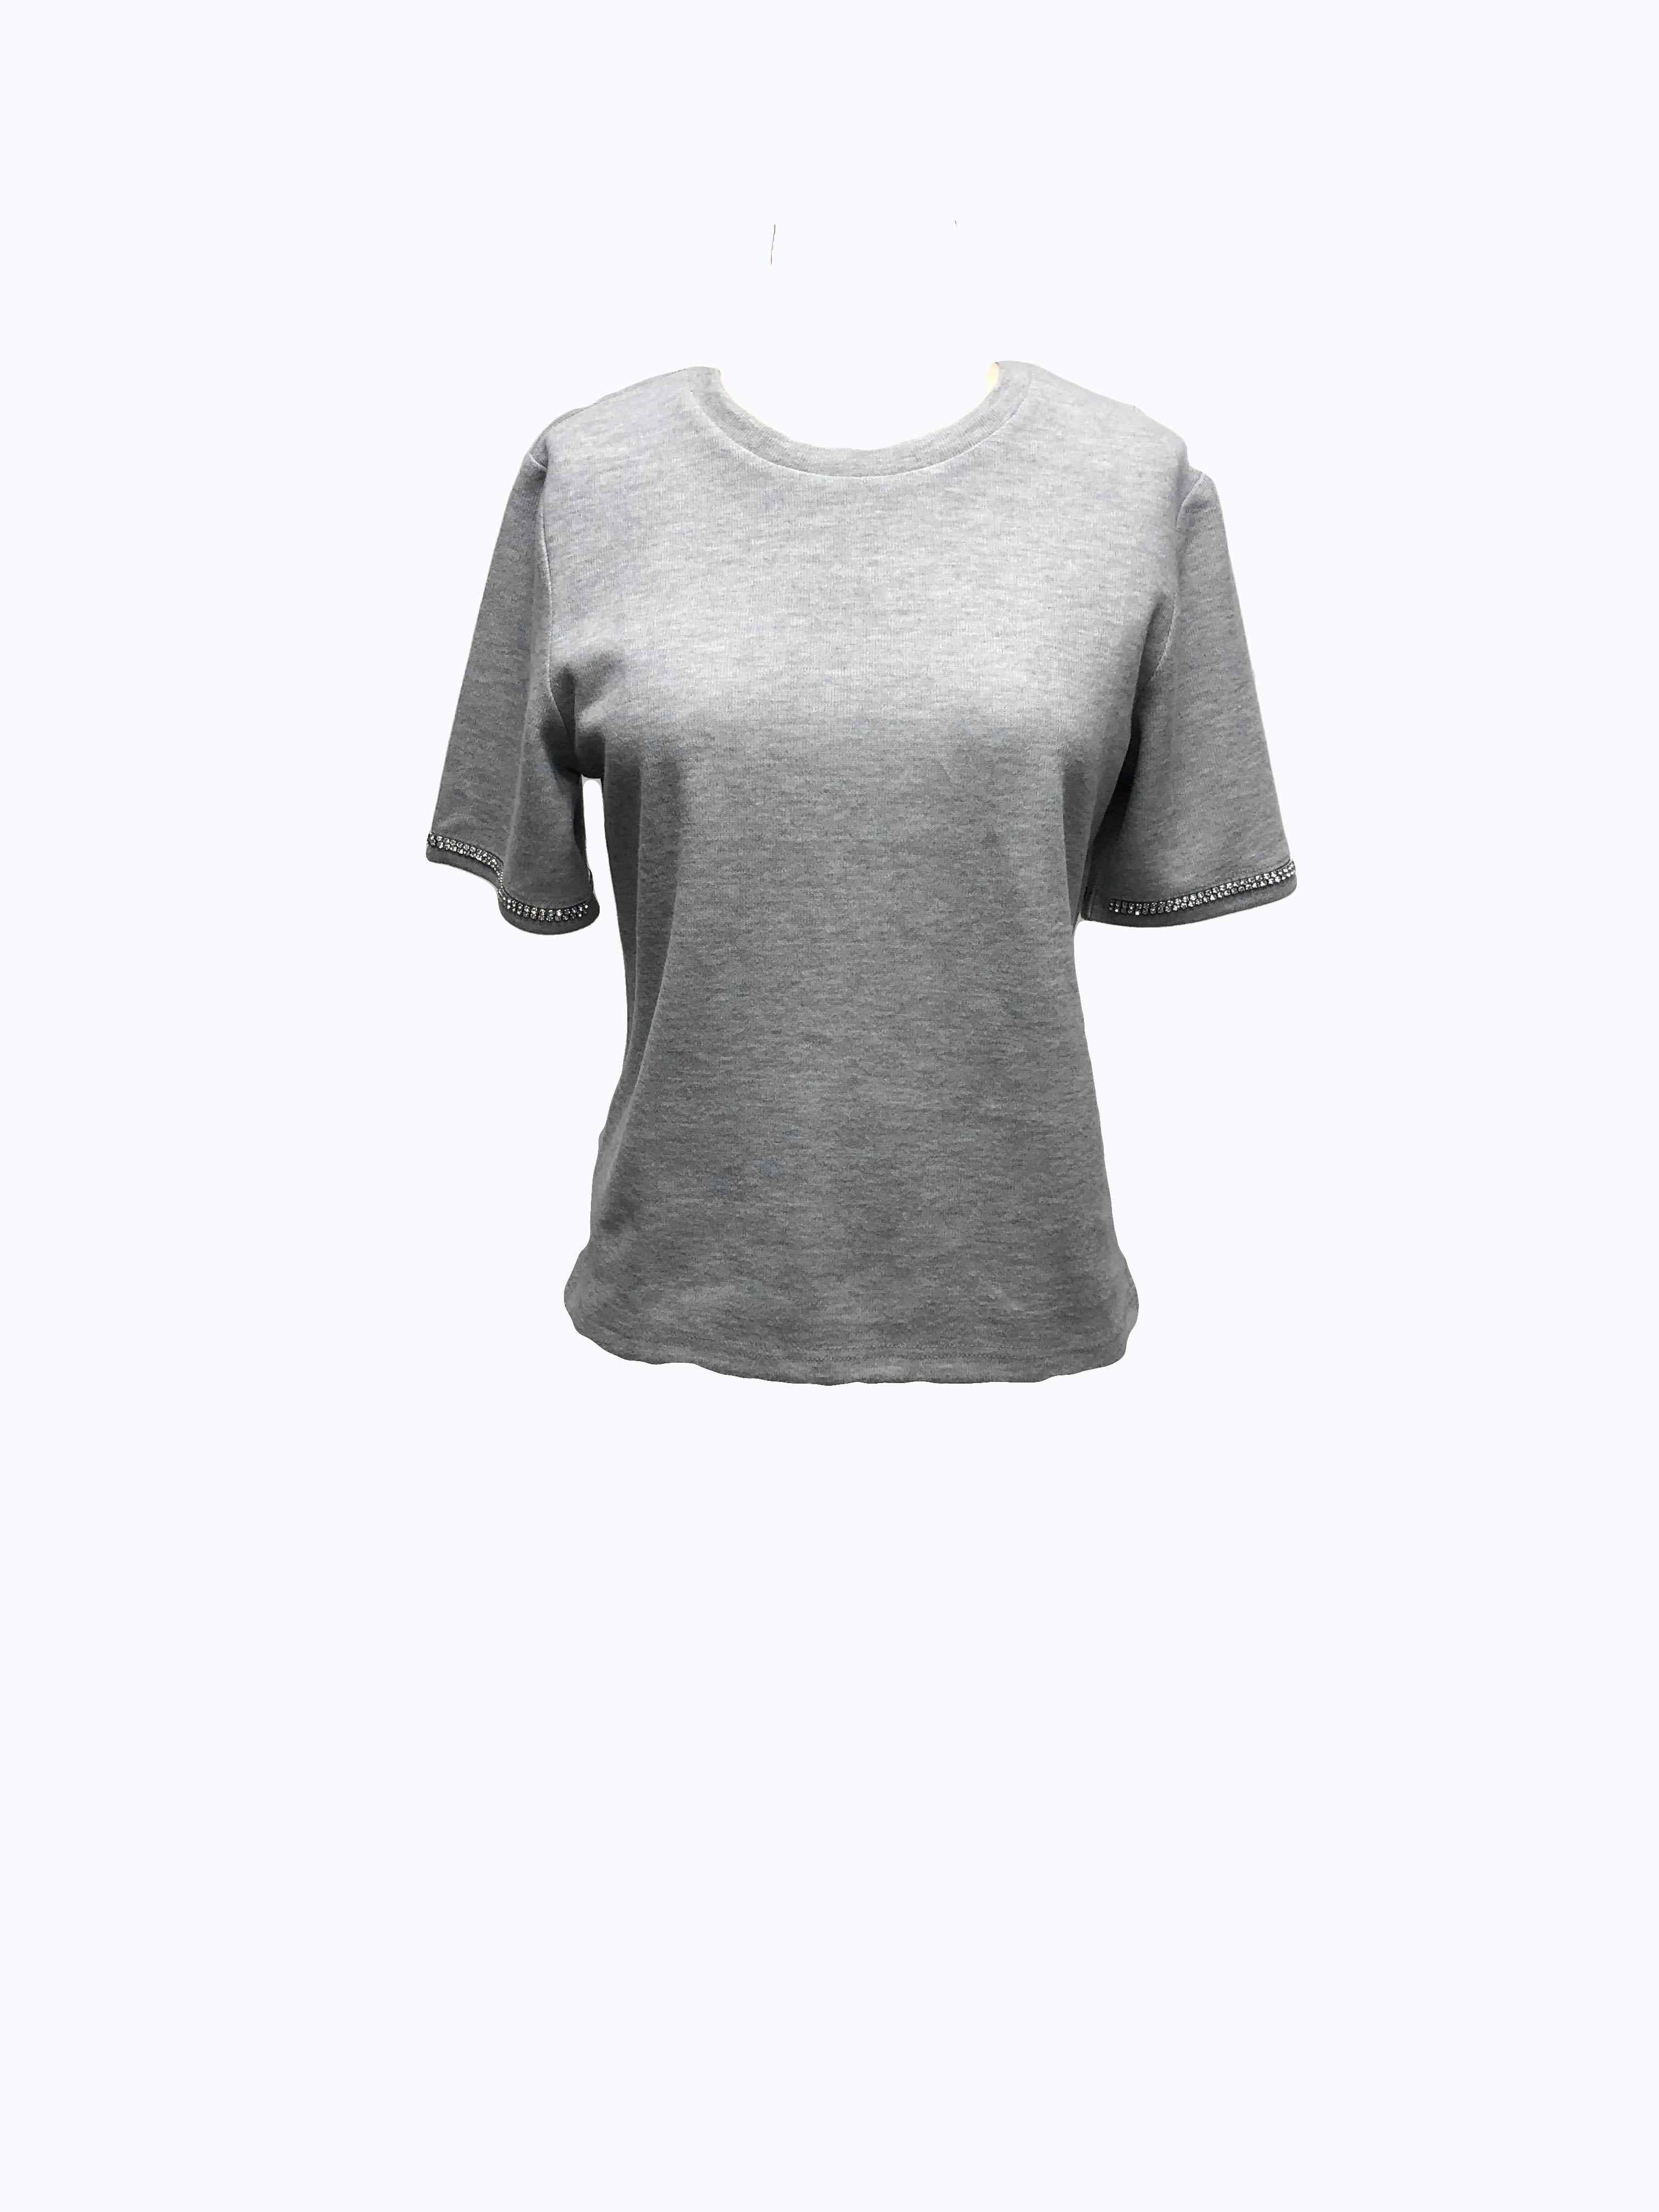 Sophia Diamond Trim Round Neckline Top - Gray - Front